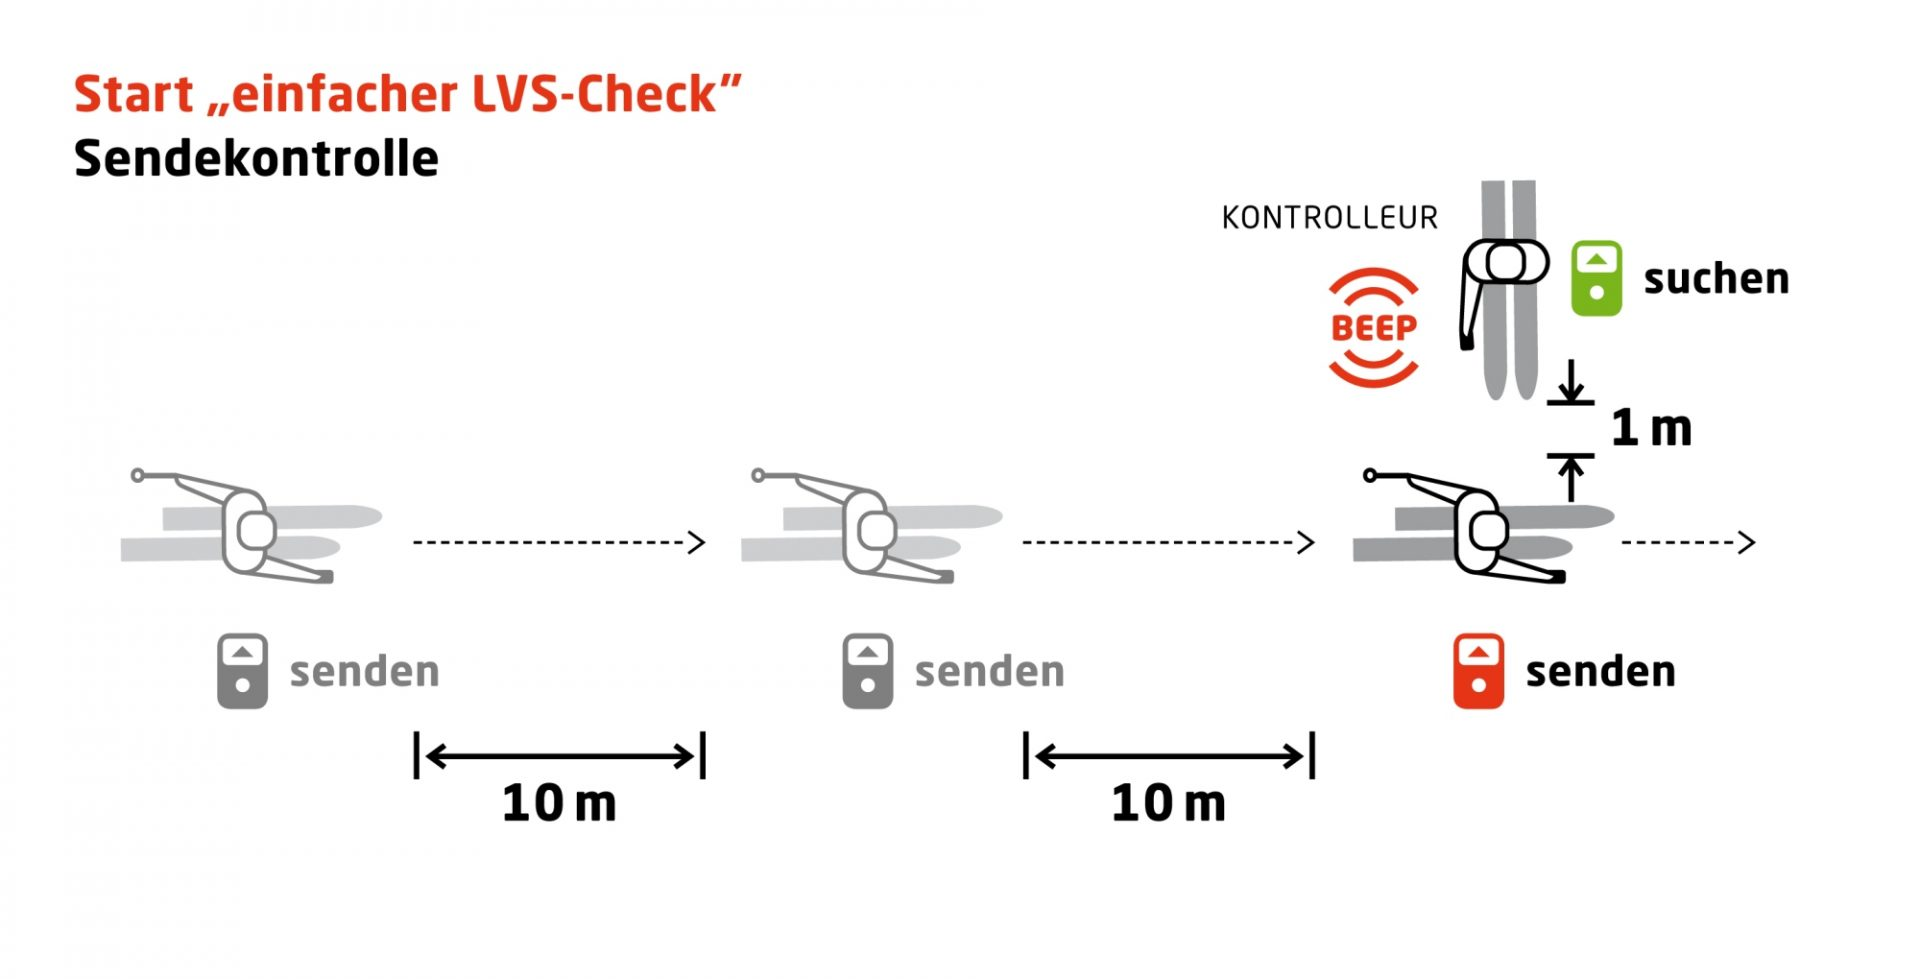 Sendekontrolle Einfacher LVS Check I AVS Archiv